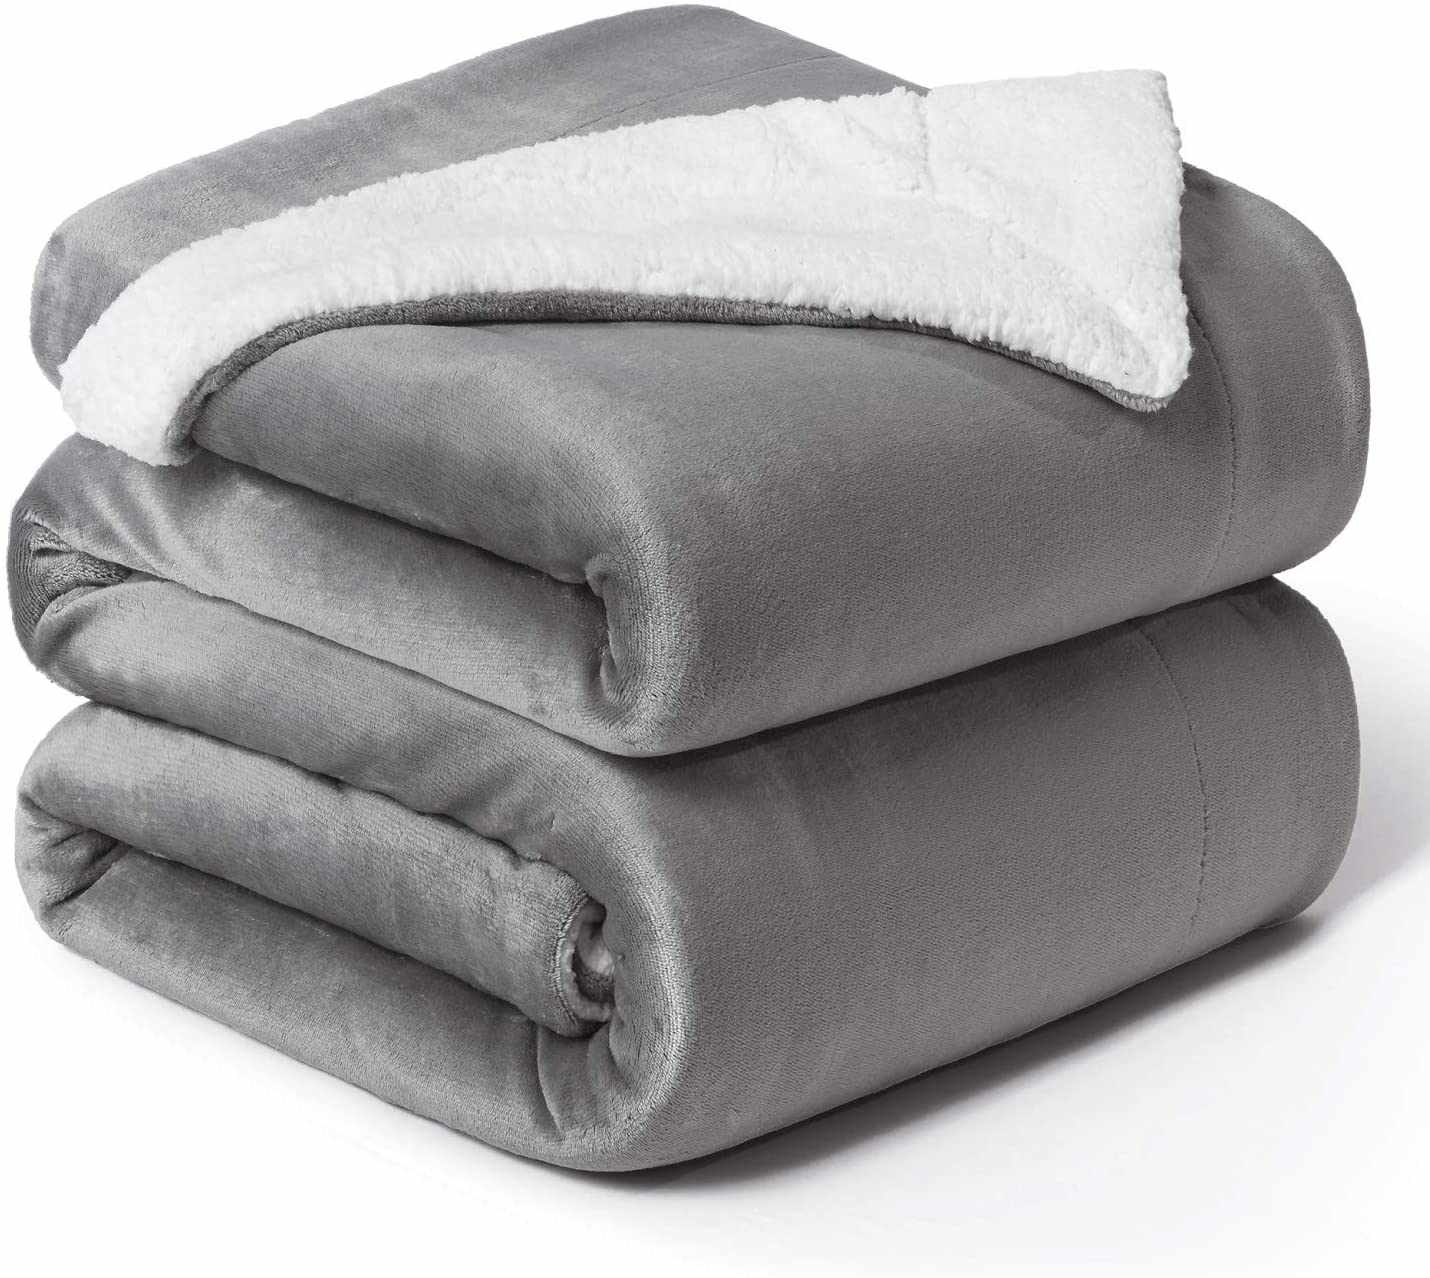 Bedsure Sherpa Blanket